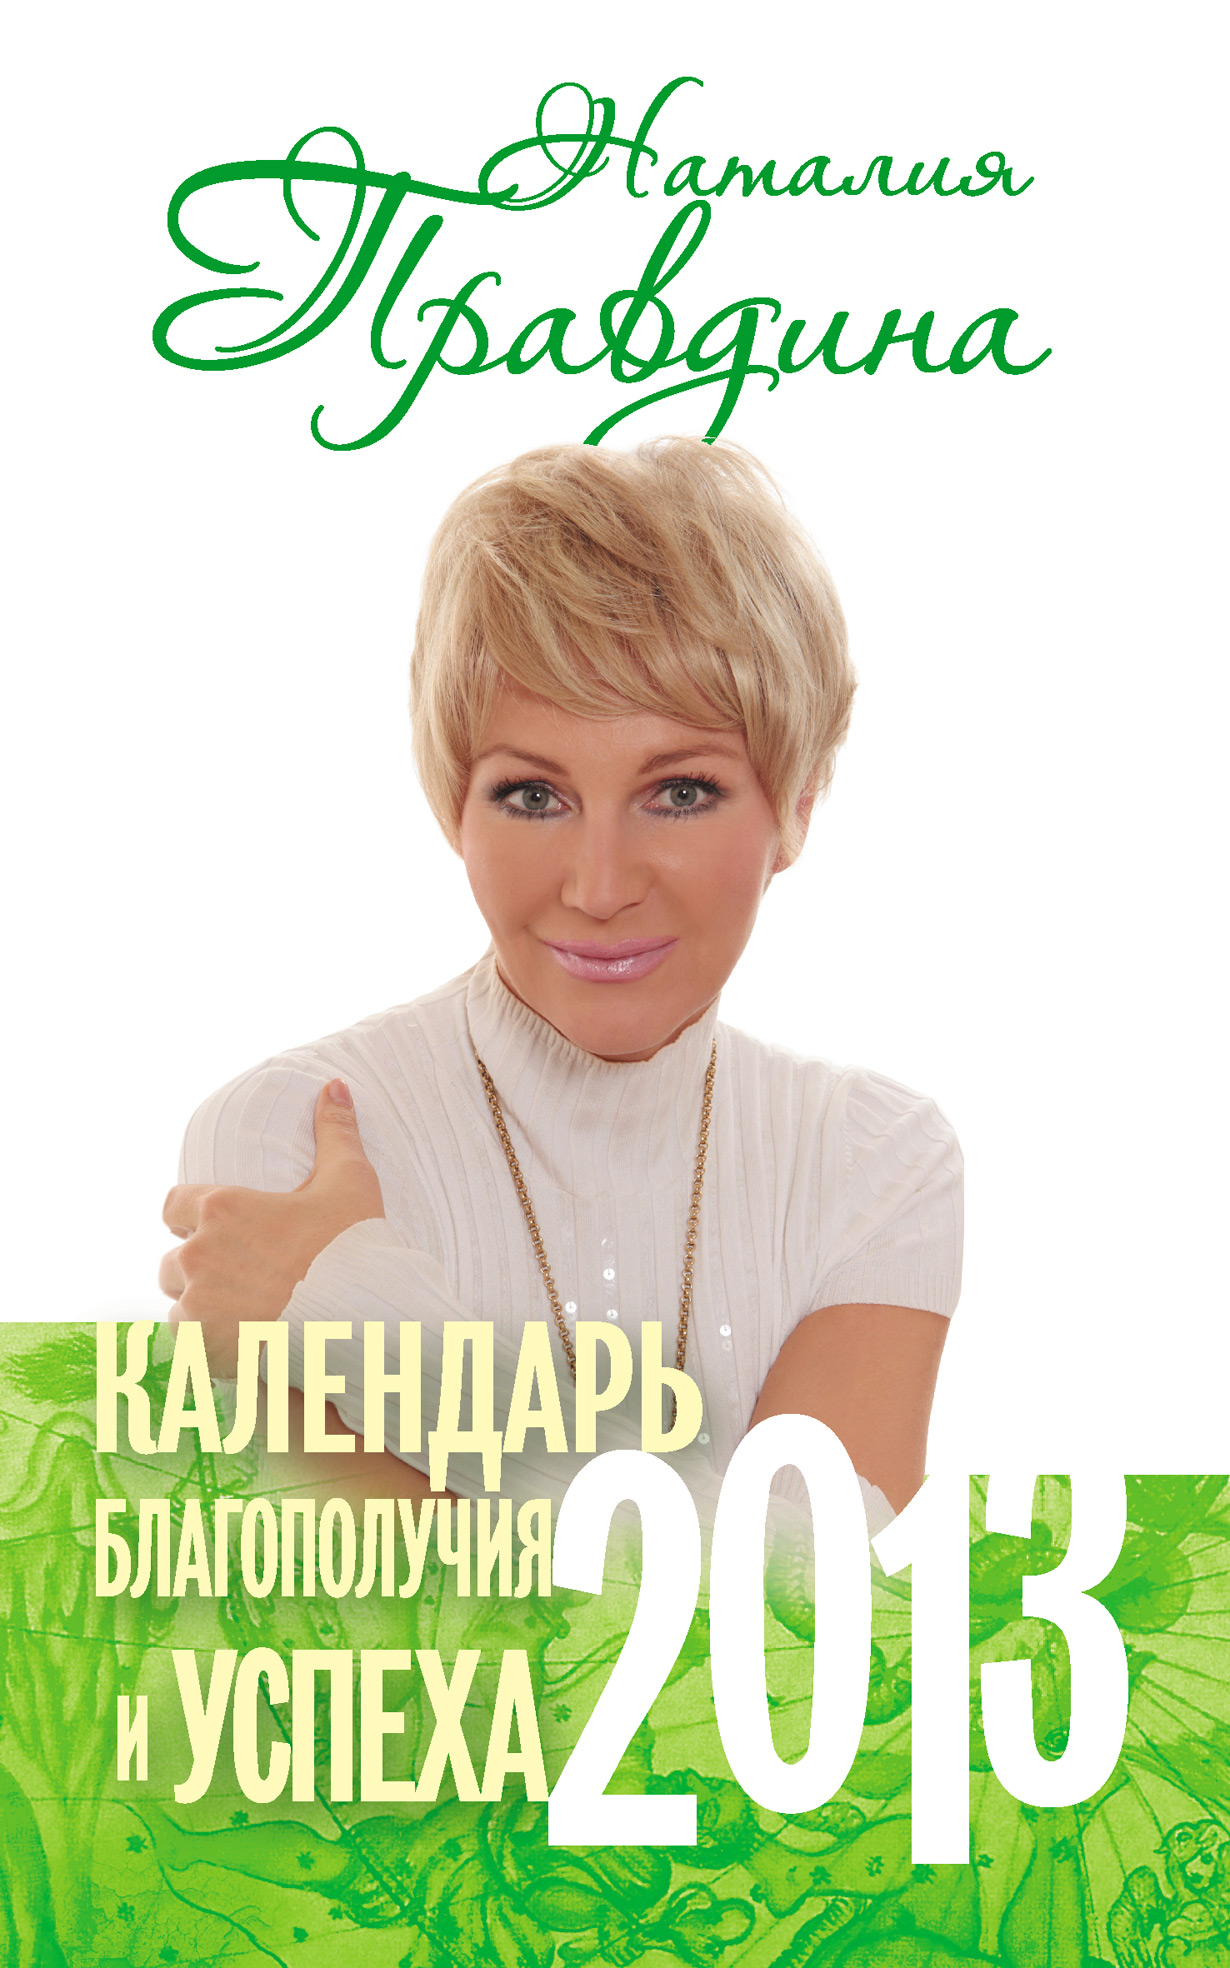 Наталия Правдина «Календарь благополучия и успеха. 2013»